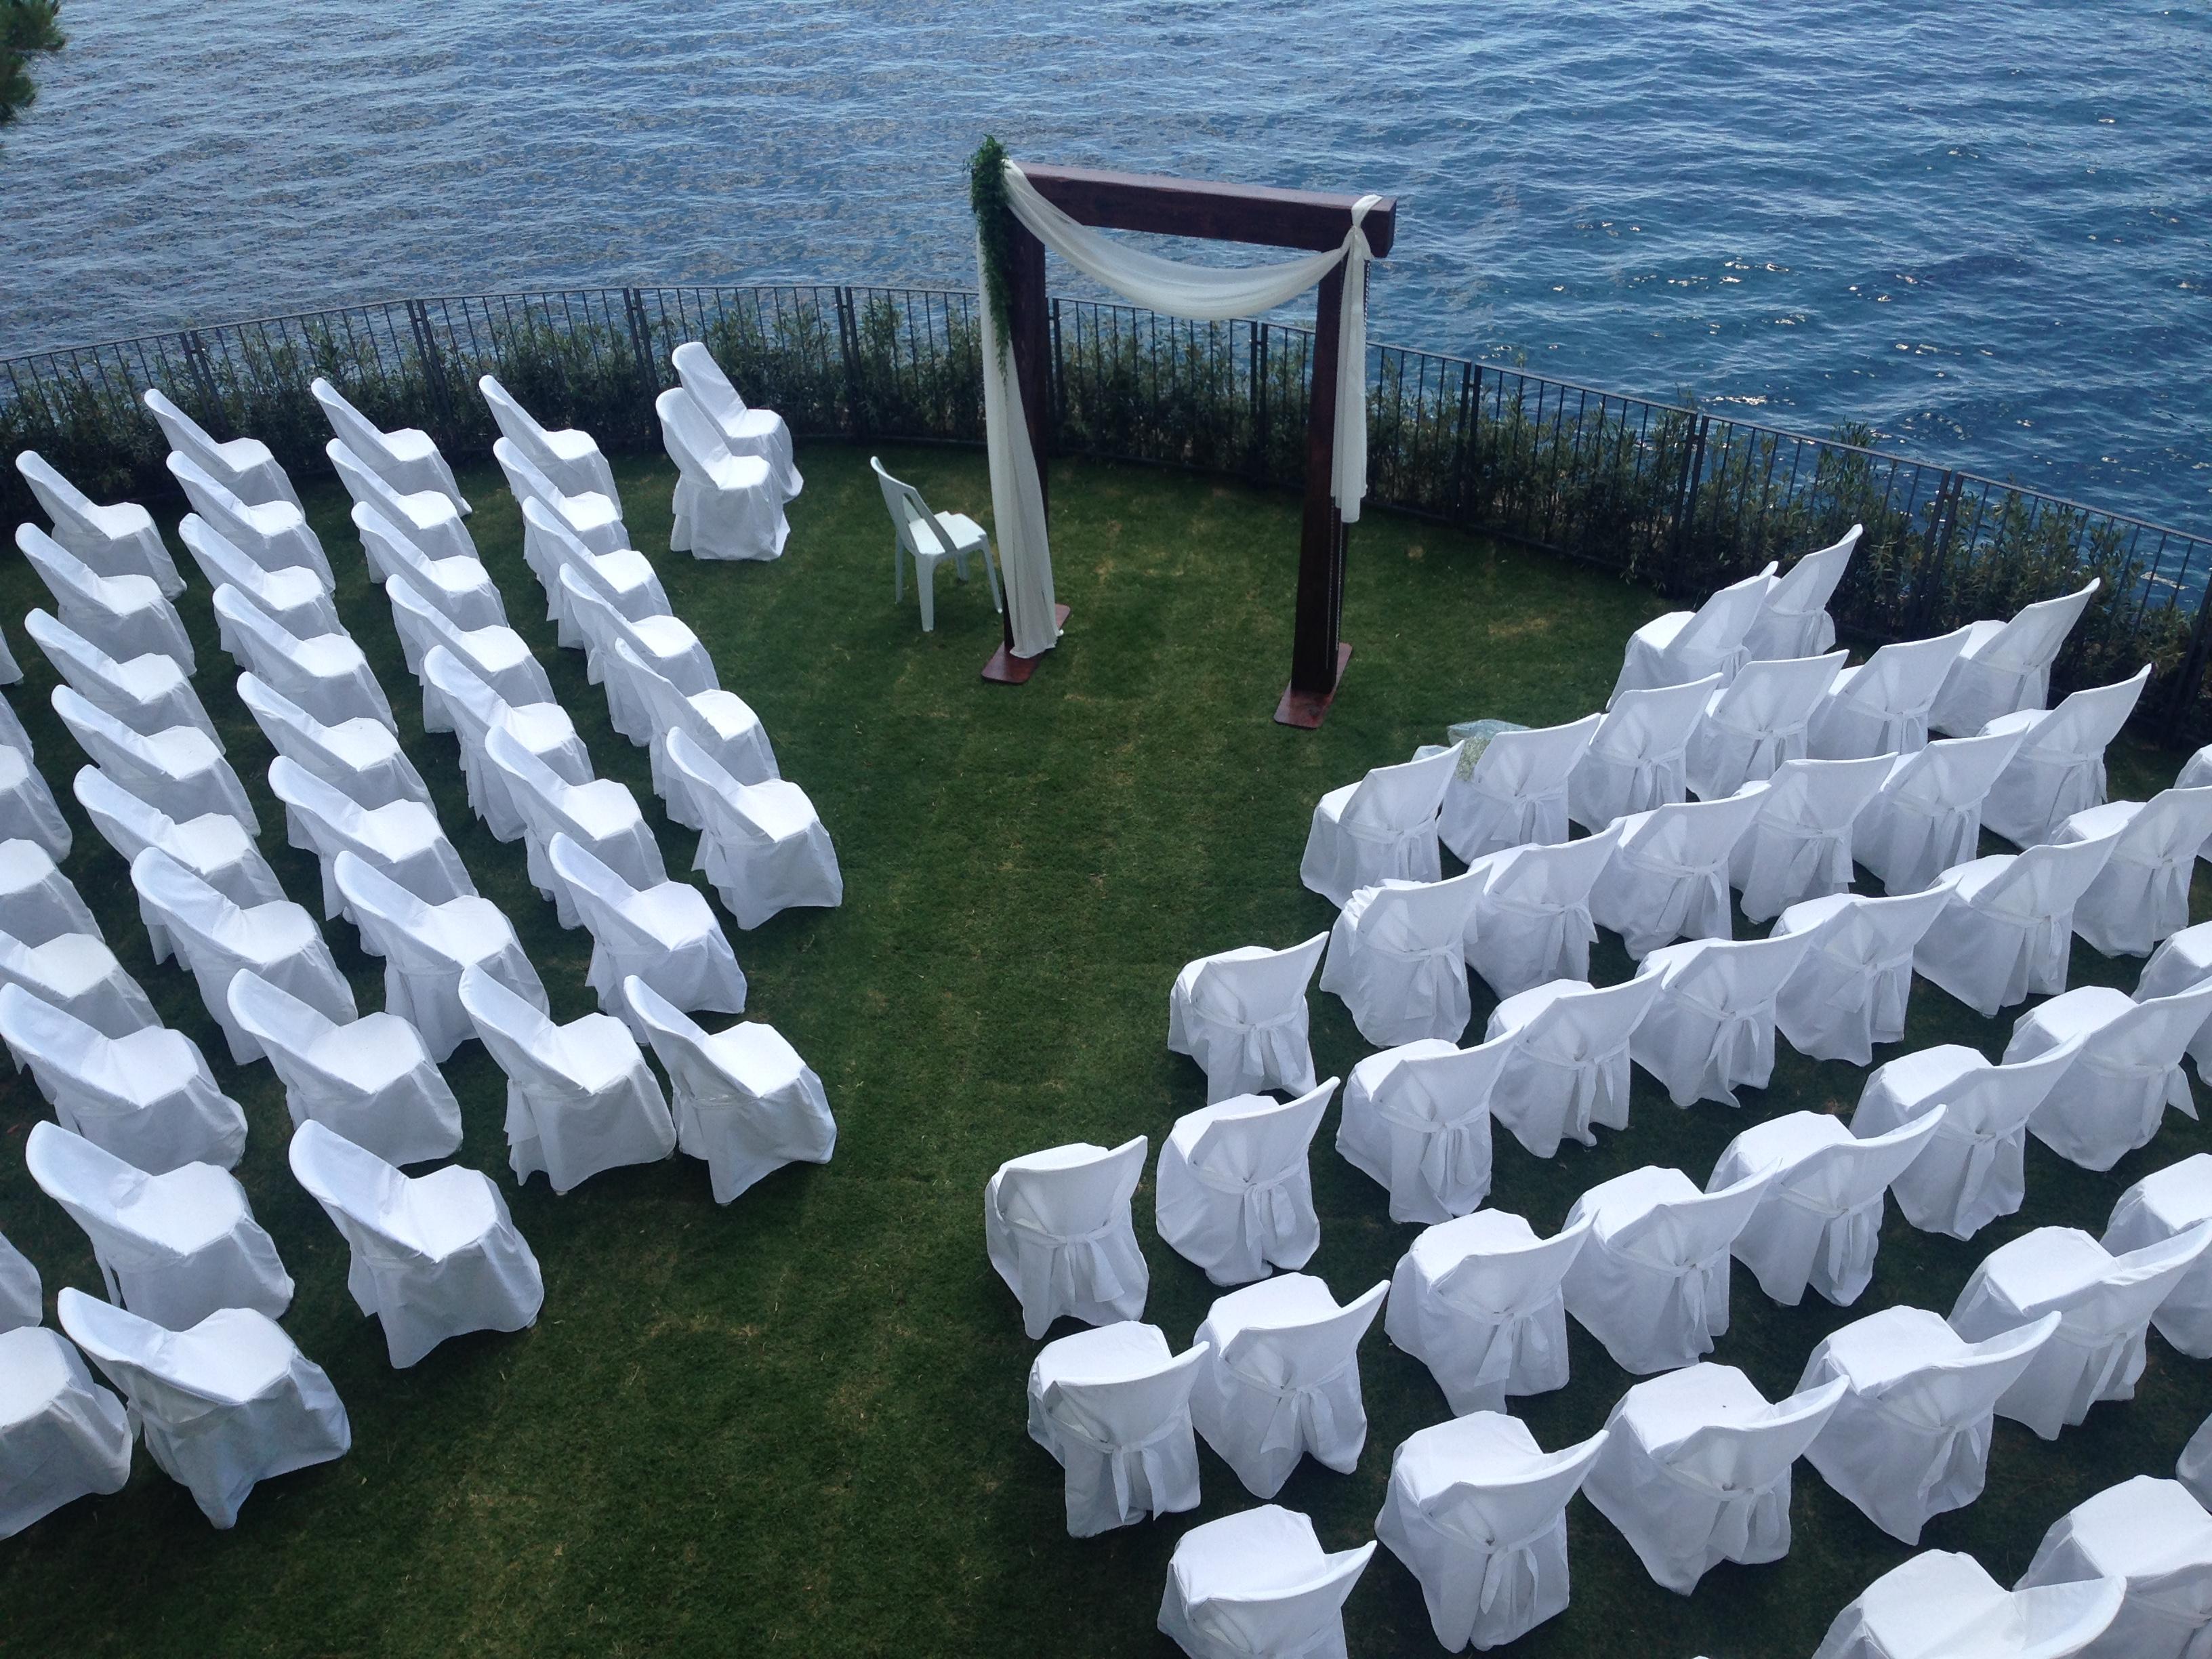 https://www.weddingamalfi.com/wp-content/uploads/Nathalie-and-Benjamin-wedding-day-in-Positano-7.jpg